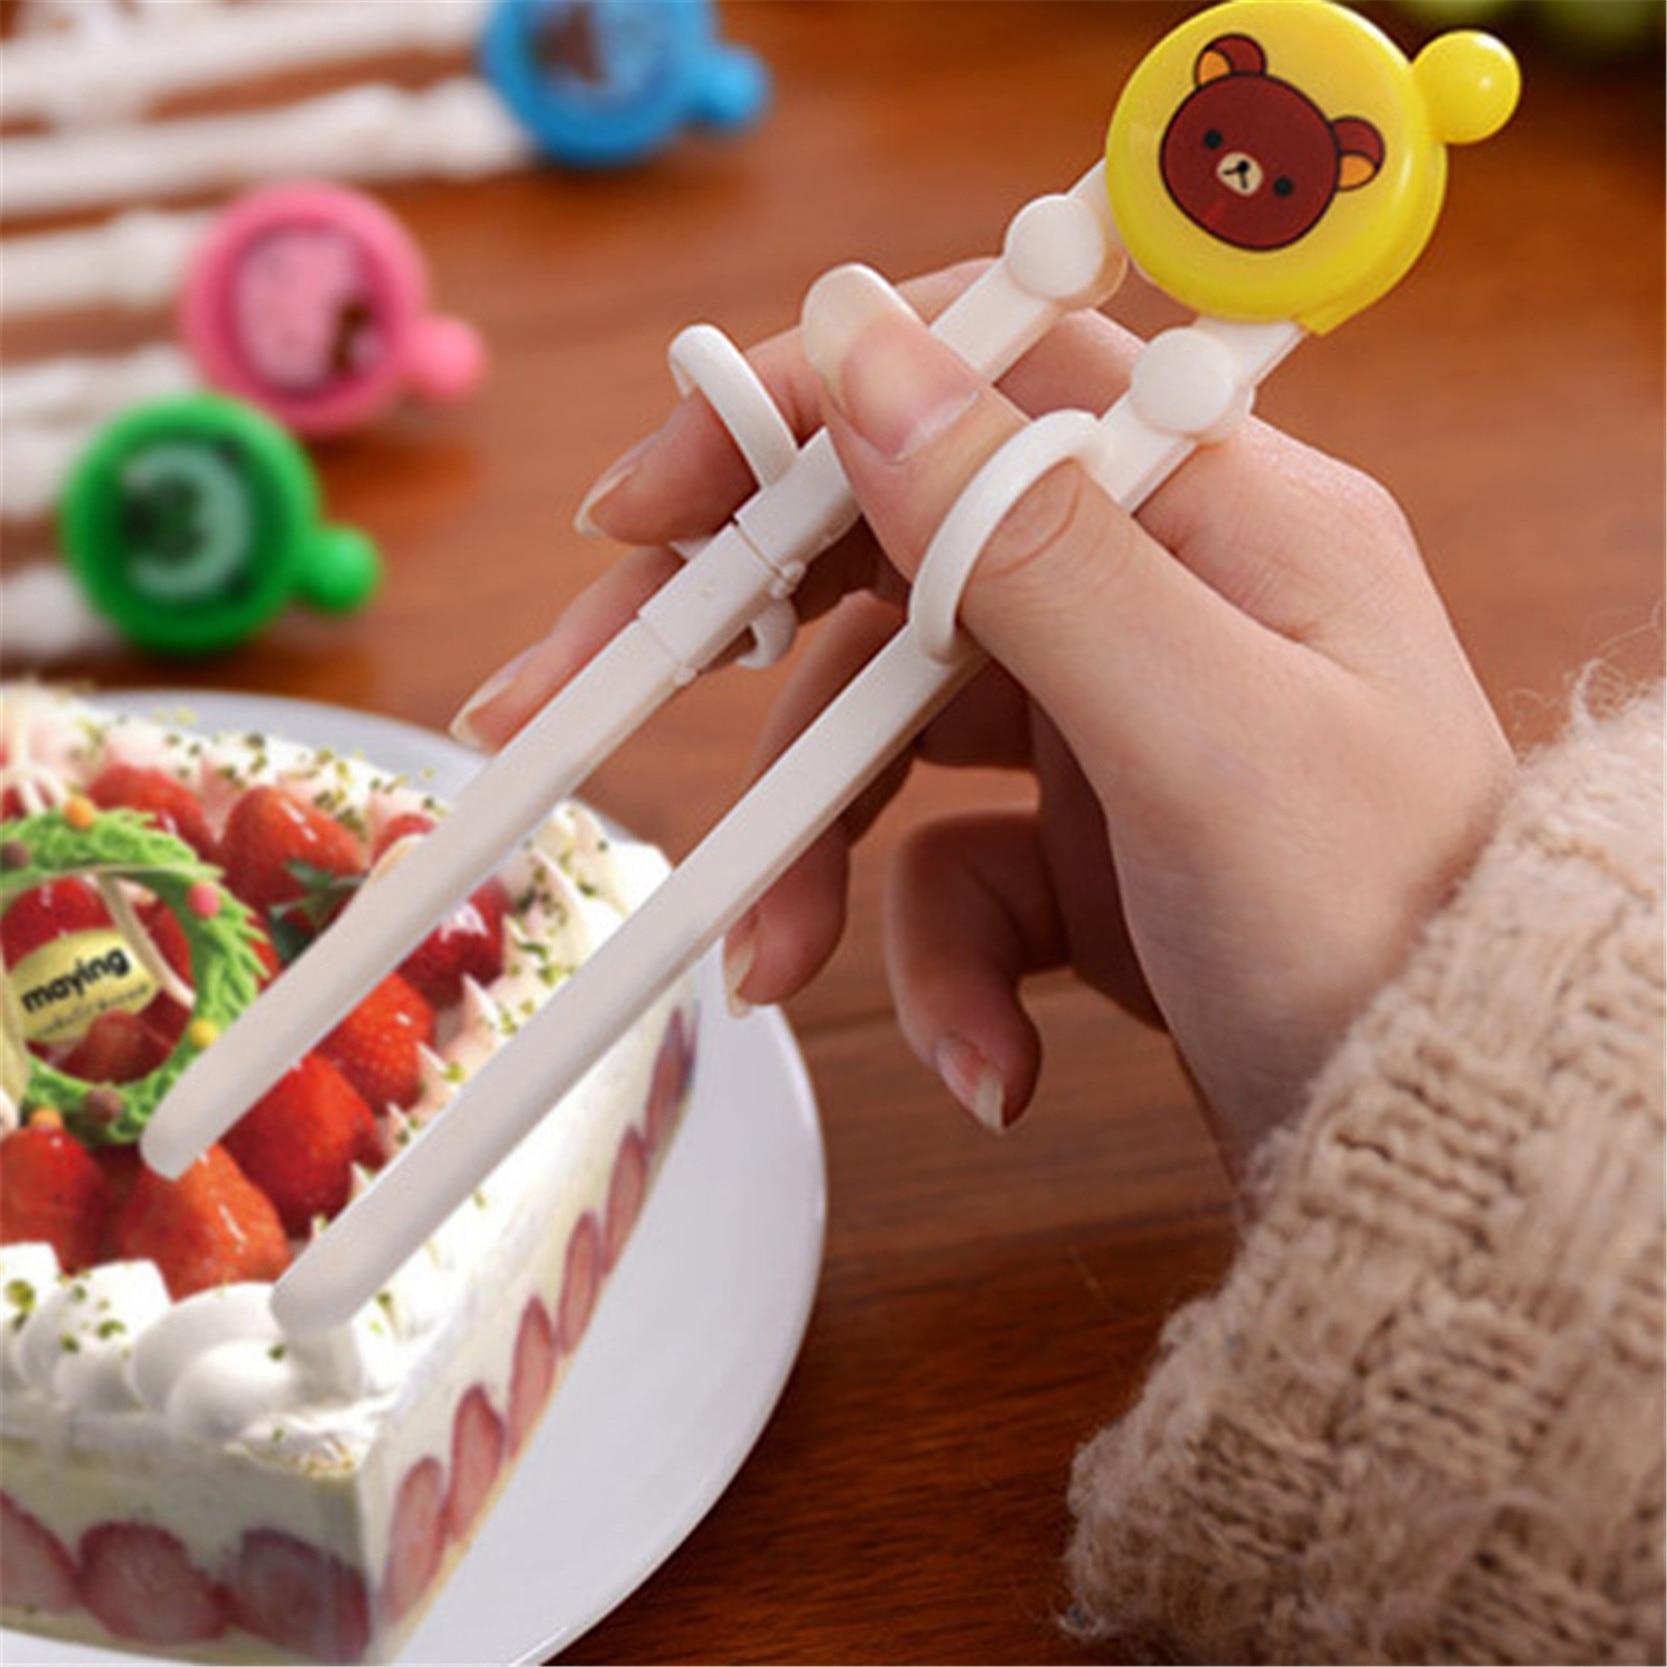 Chopsticks Training Sumpit Latihan Anak Motif Lucu 1 Pcs Daftar Ahm011 Belajar Untuk Balita Cartoon Style Kids Children Early Learning Designed Baby Enlightenment 2016 Random Color